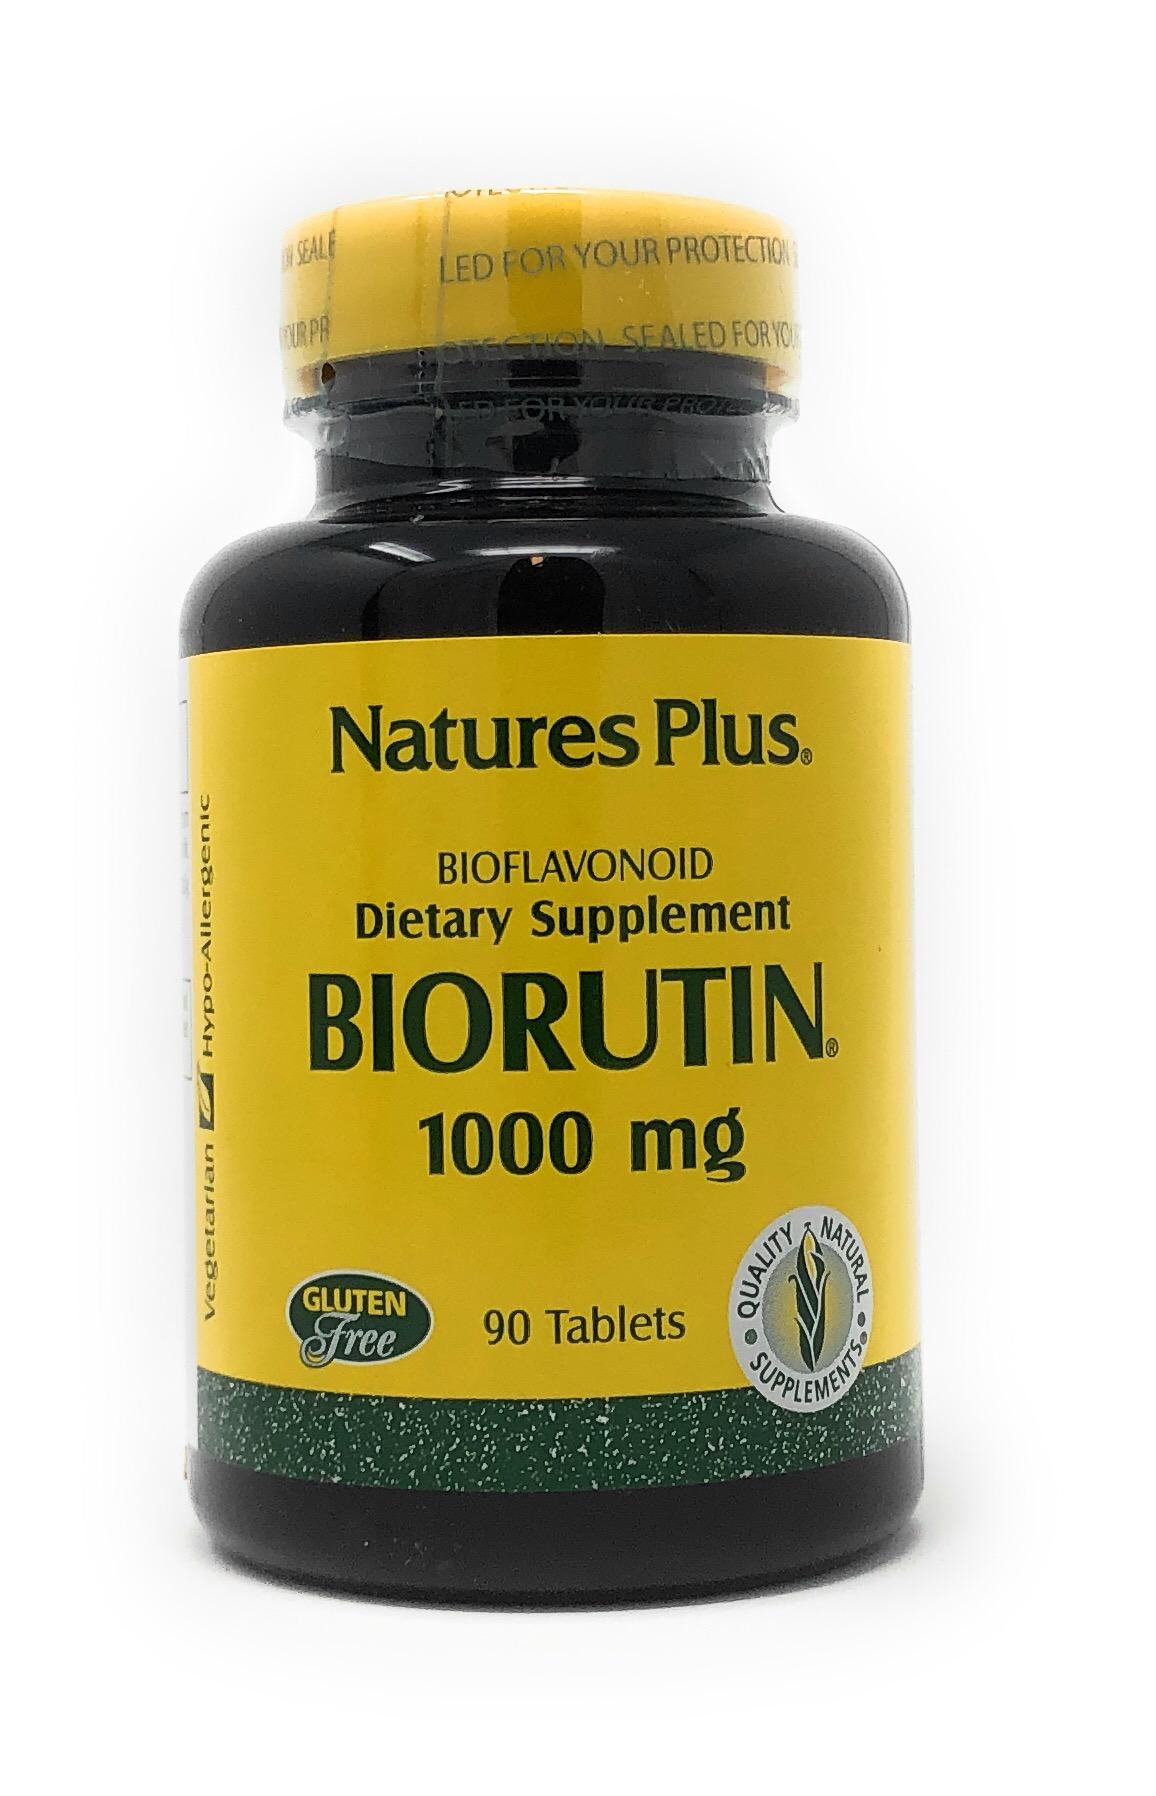 Natures Plus Biorutin 1000mg 90 Tabletten (130,1g)